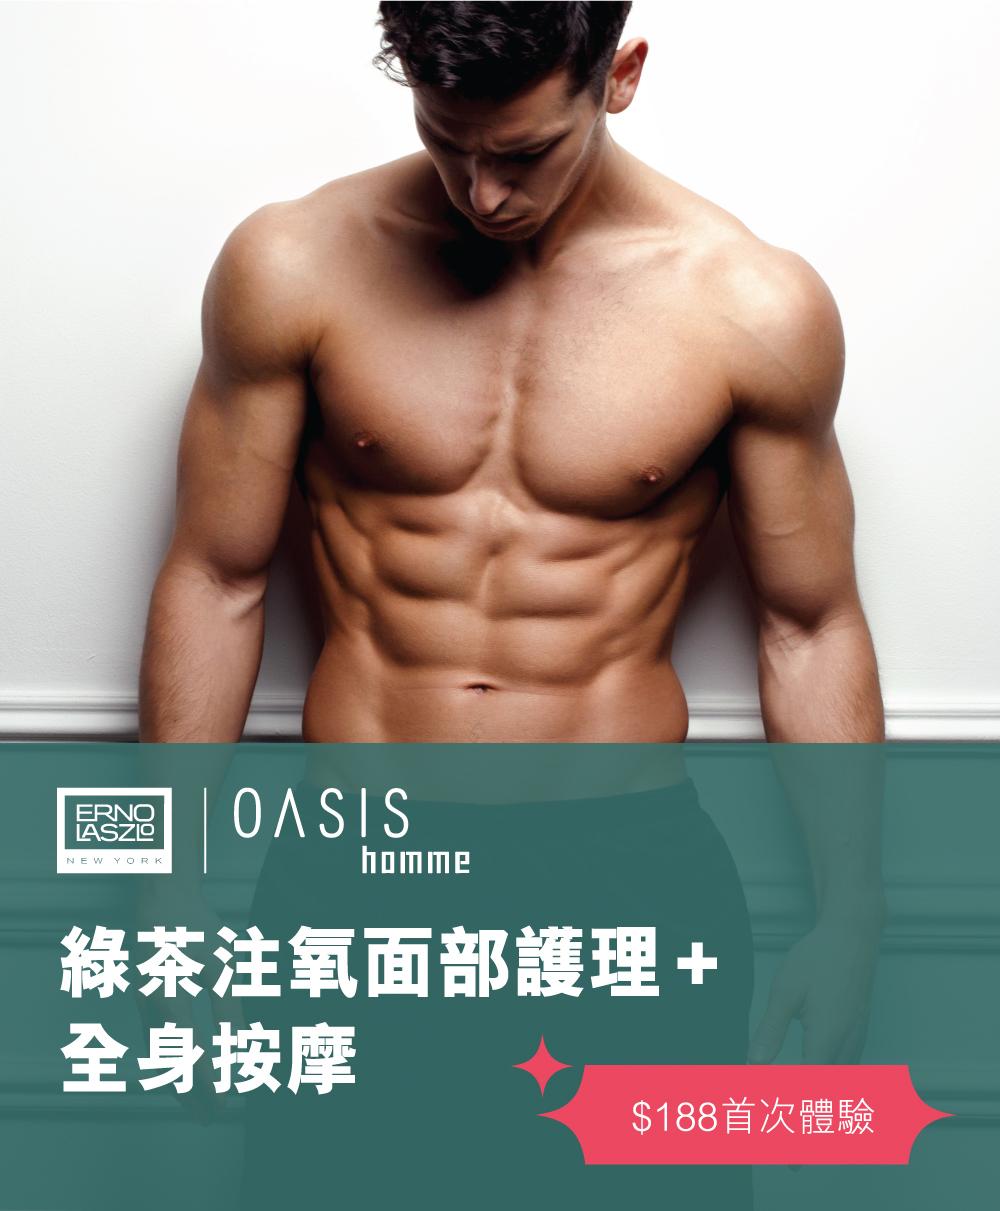 男士美容,潔面, 保濕,OASIS Homme,